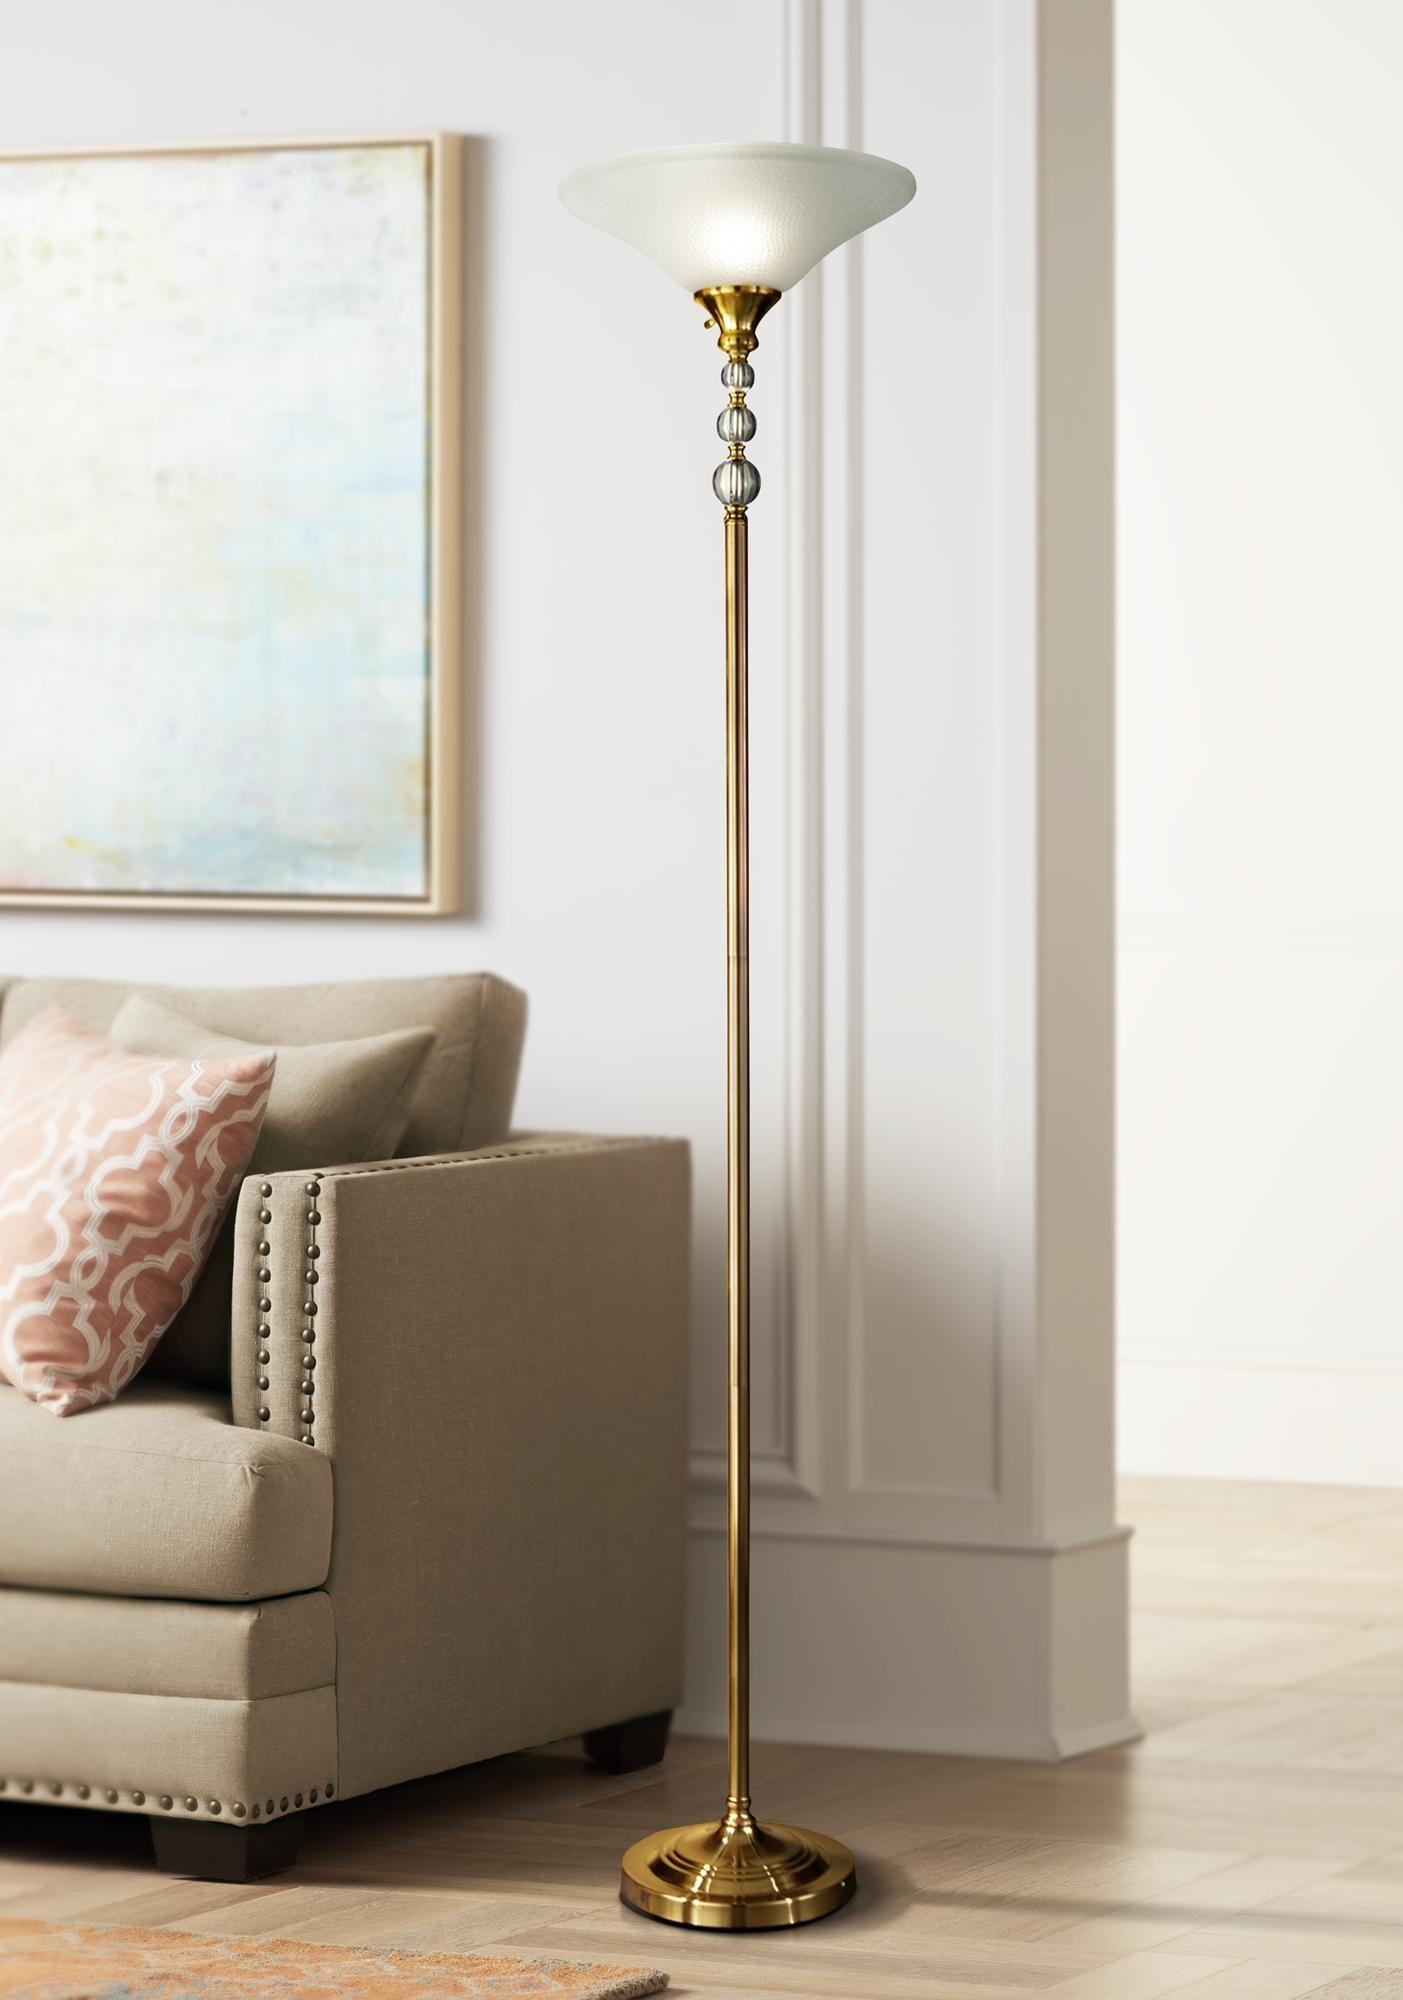 Floor Lamps Dale Tiffany Optic Antique Brass Torchiere Floor Lamp In 2020 Torchiere Floor Lamp Floor Lamp Lamp